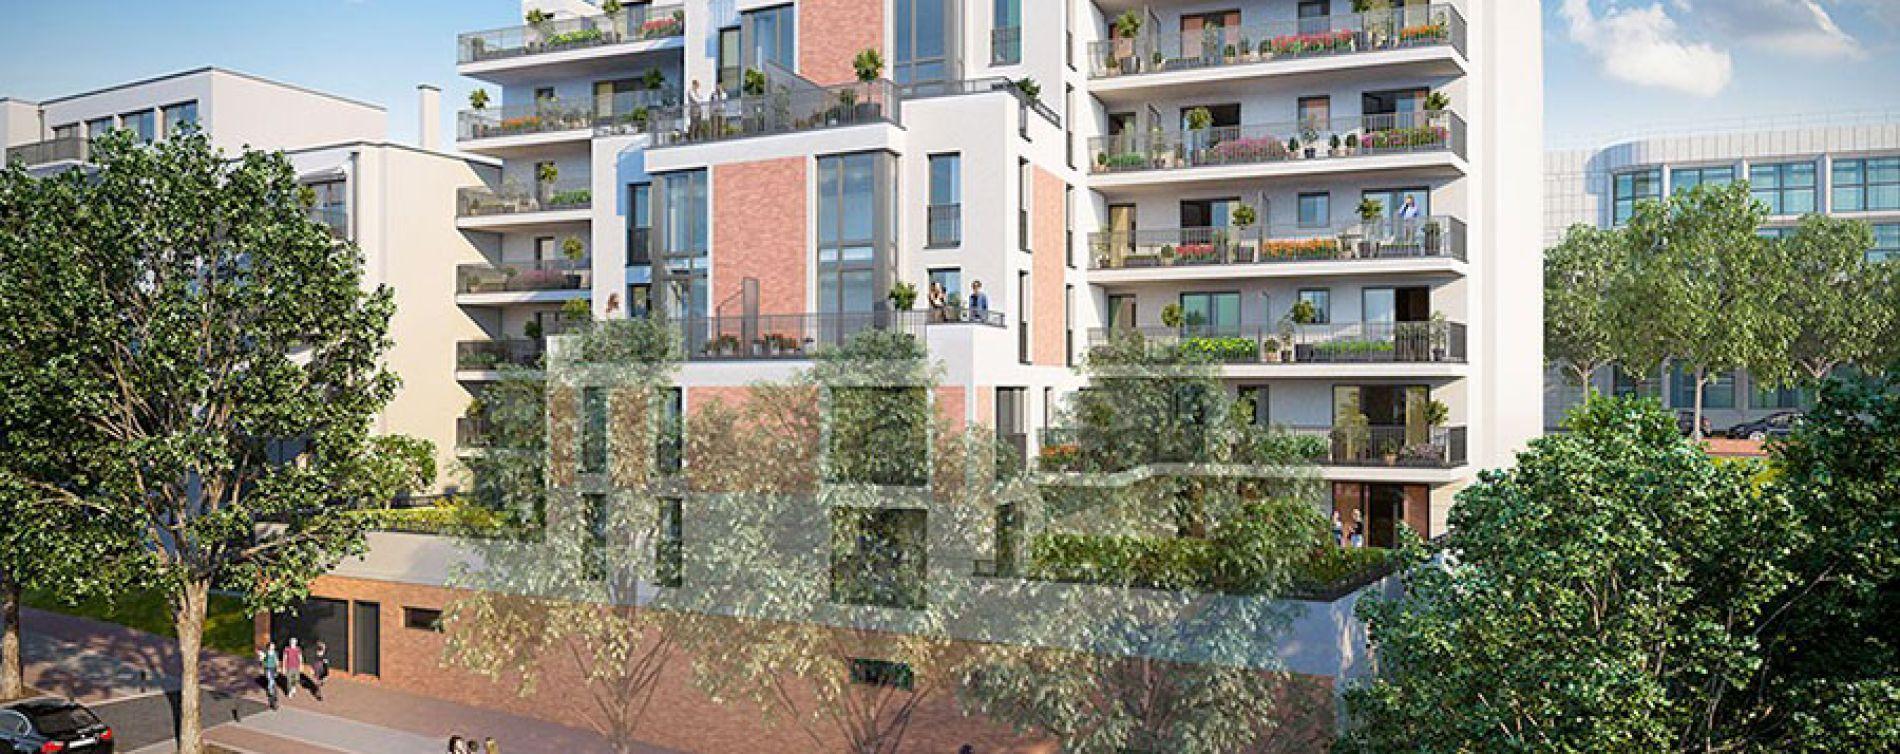 Saint-Maurice : programme immobilier neuve « Panoramiq' »